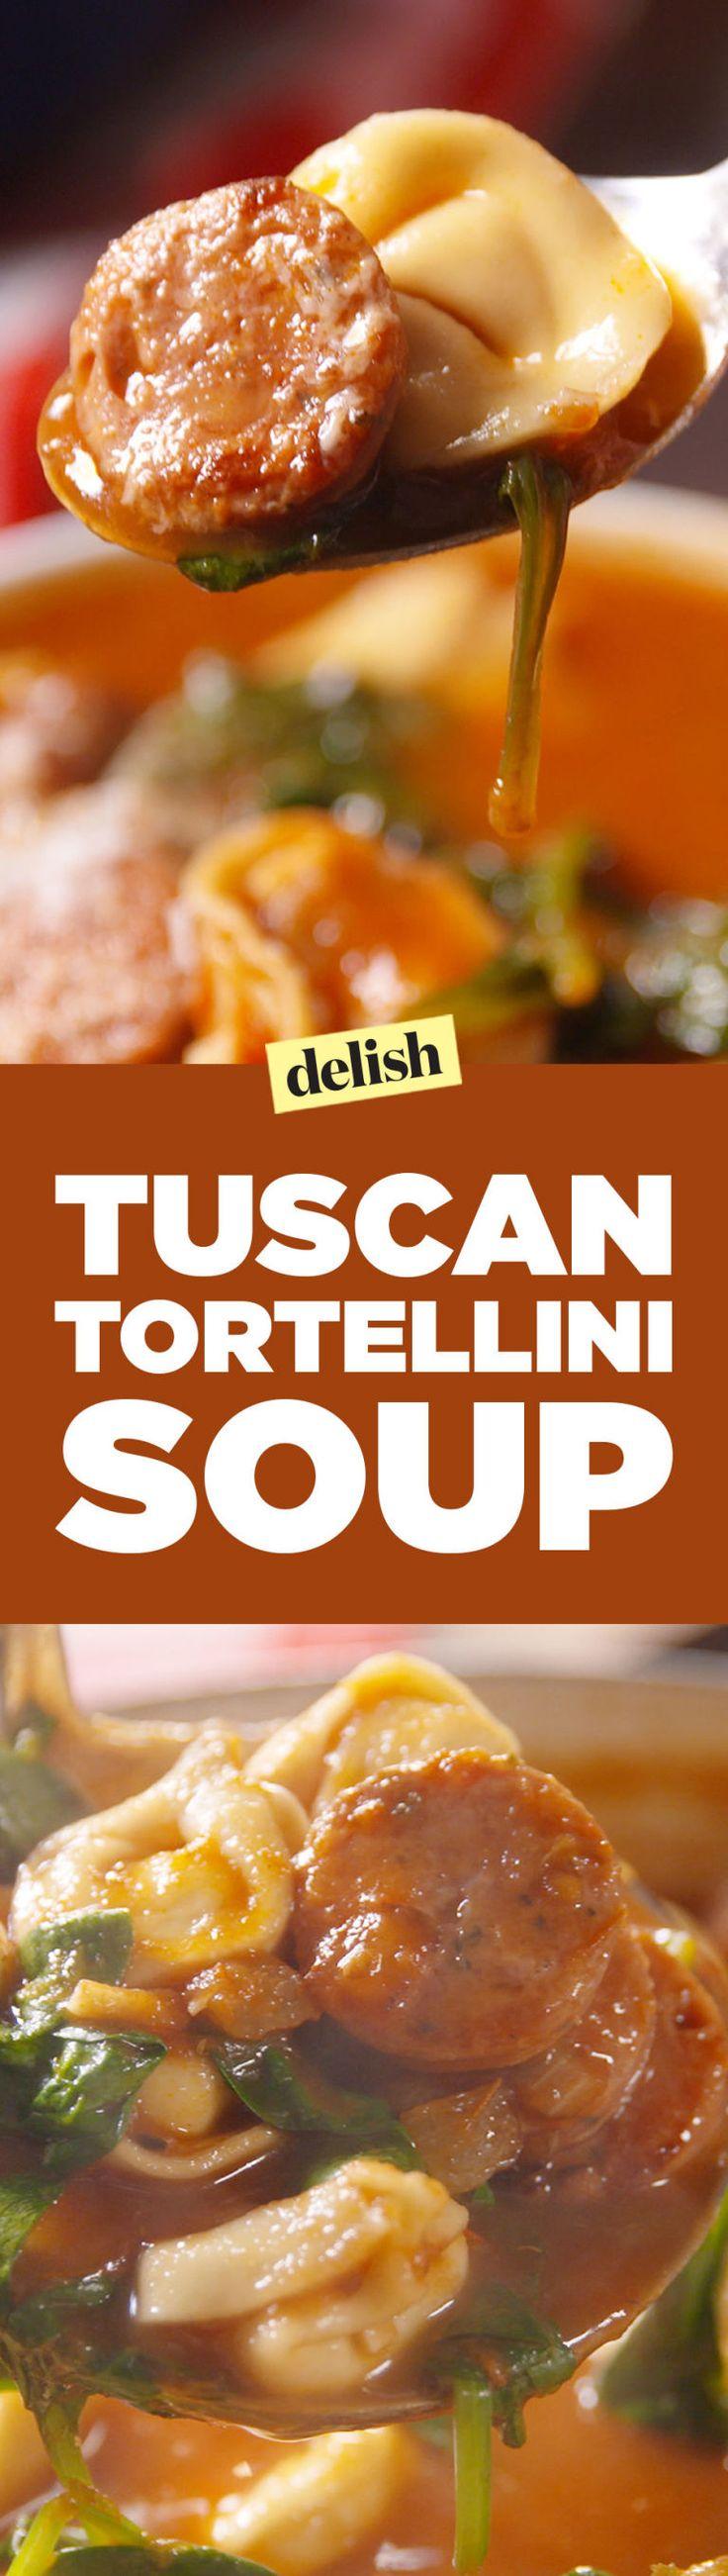 Tuscan Tortellini Soup  - Delish.com